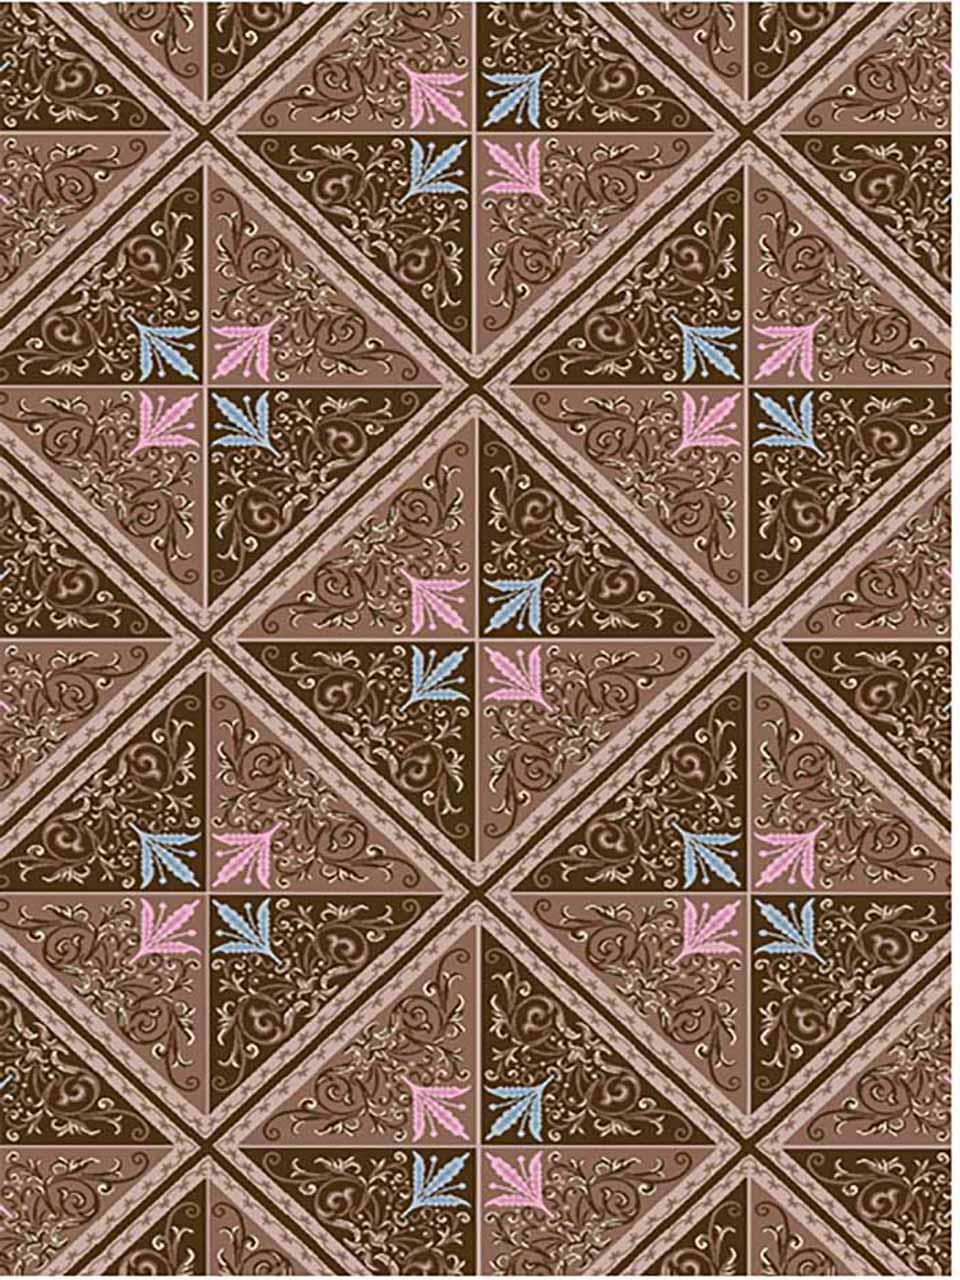 فرش (7000) پلی پرو پیلن - 8 رنگ - 410 شانه - قهوه ای - تراکم 1000